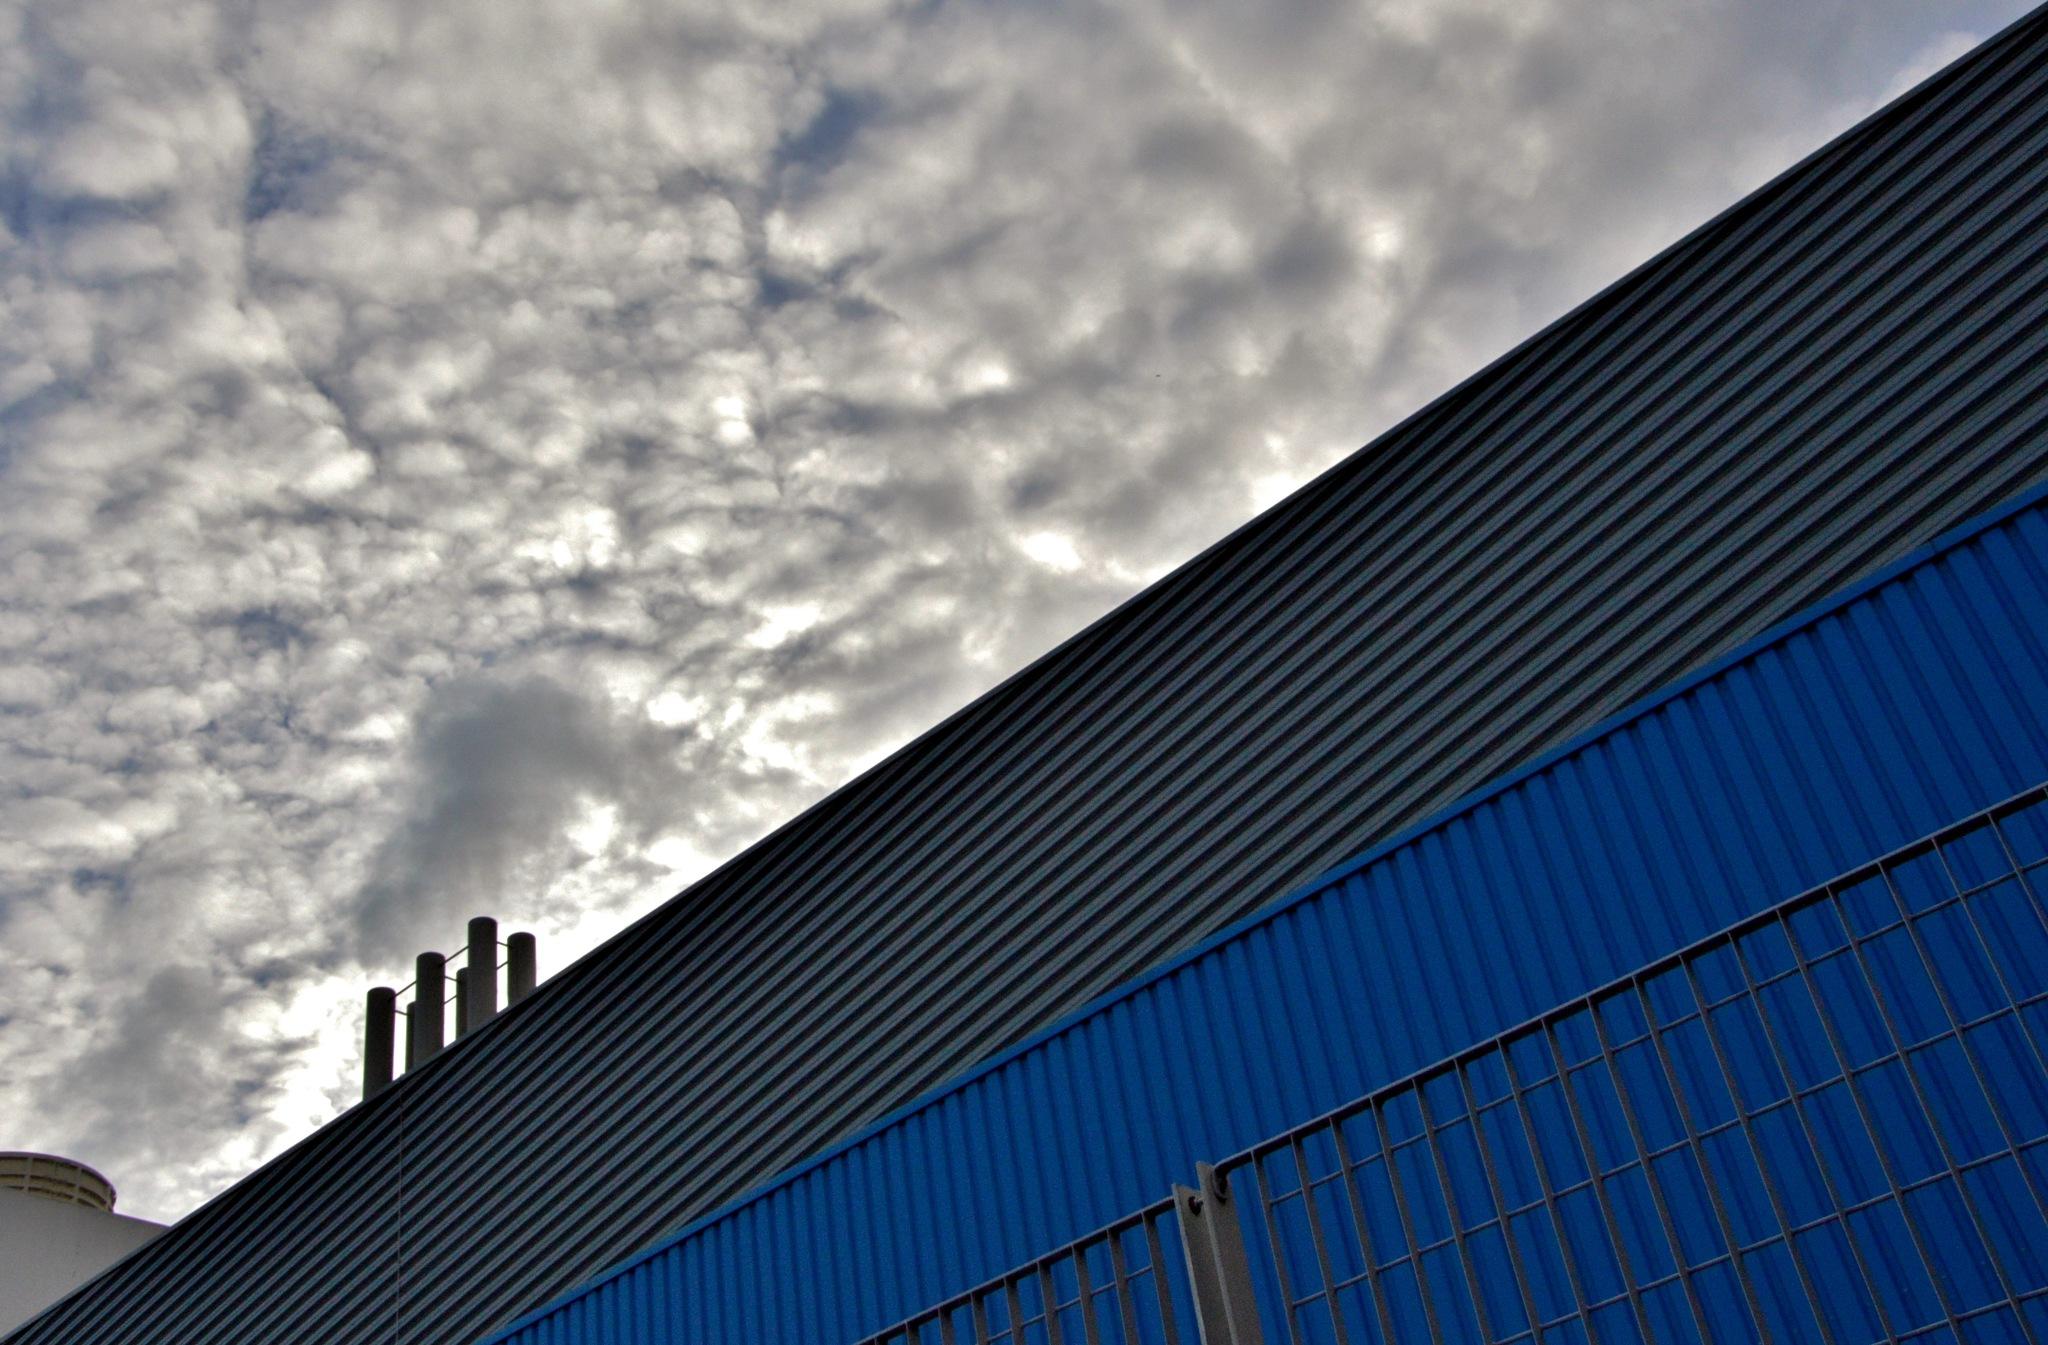 Factory clouds by lorena.rinaudo.9